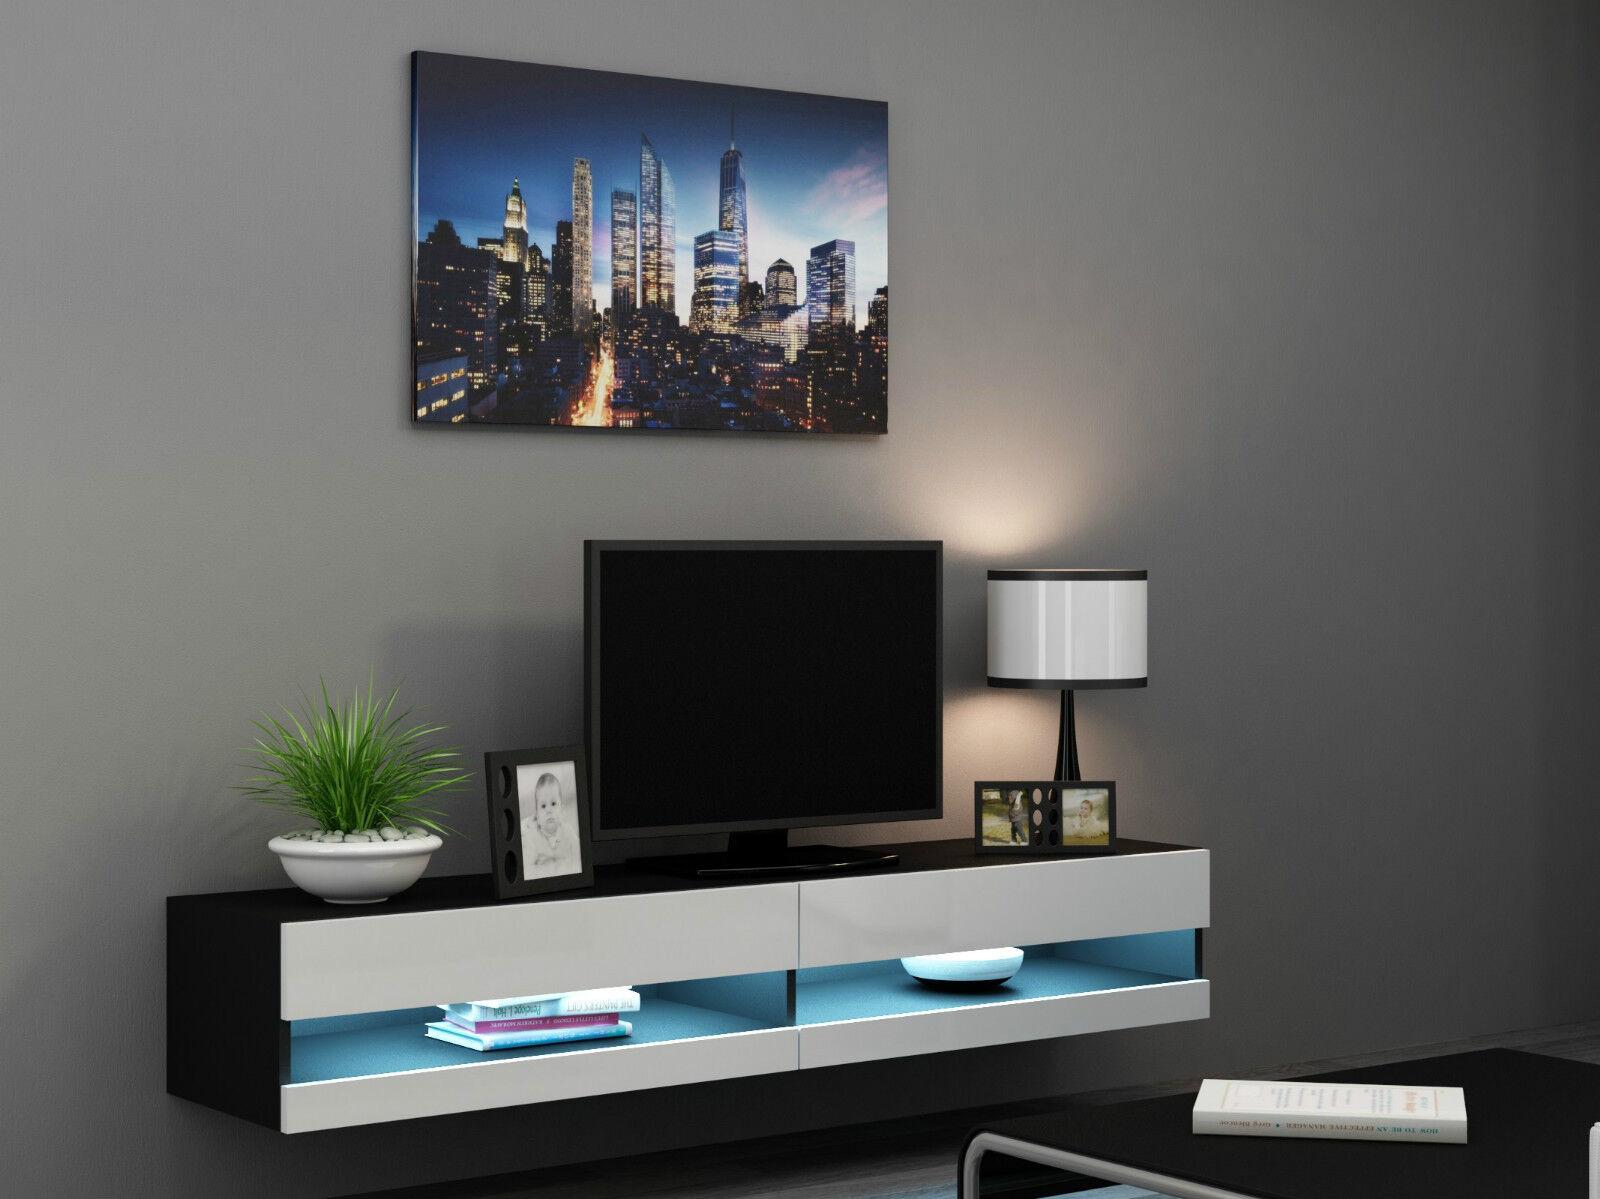 tv wall unit tv stand floating bench vivo new ebay. Black Bedroom Furniture Sets. Home Design Ideas